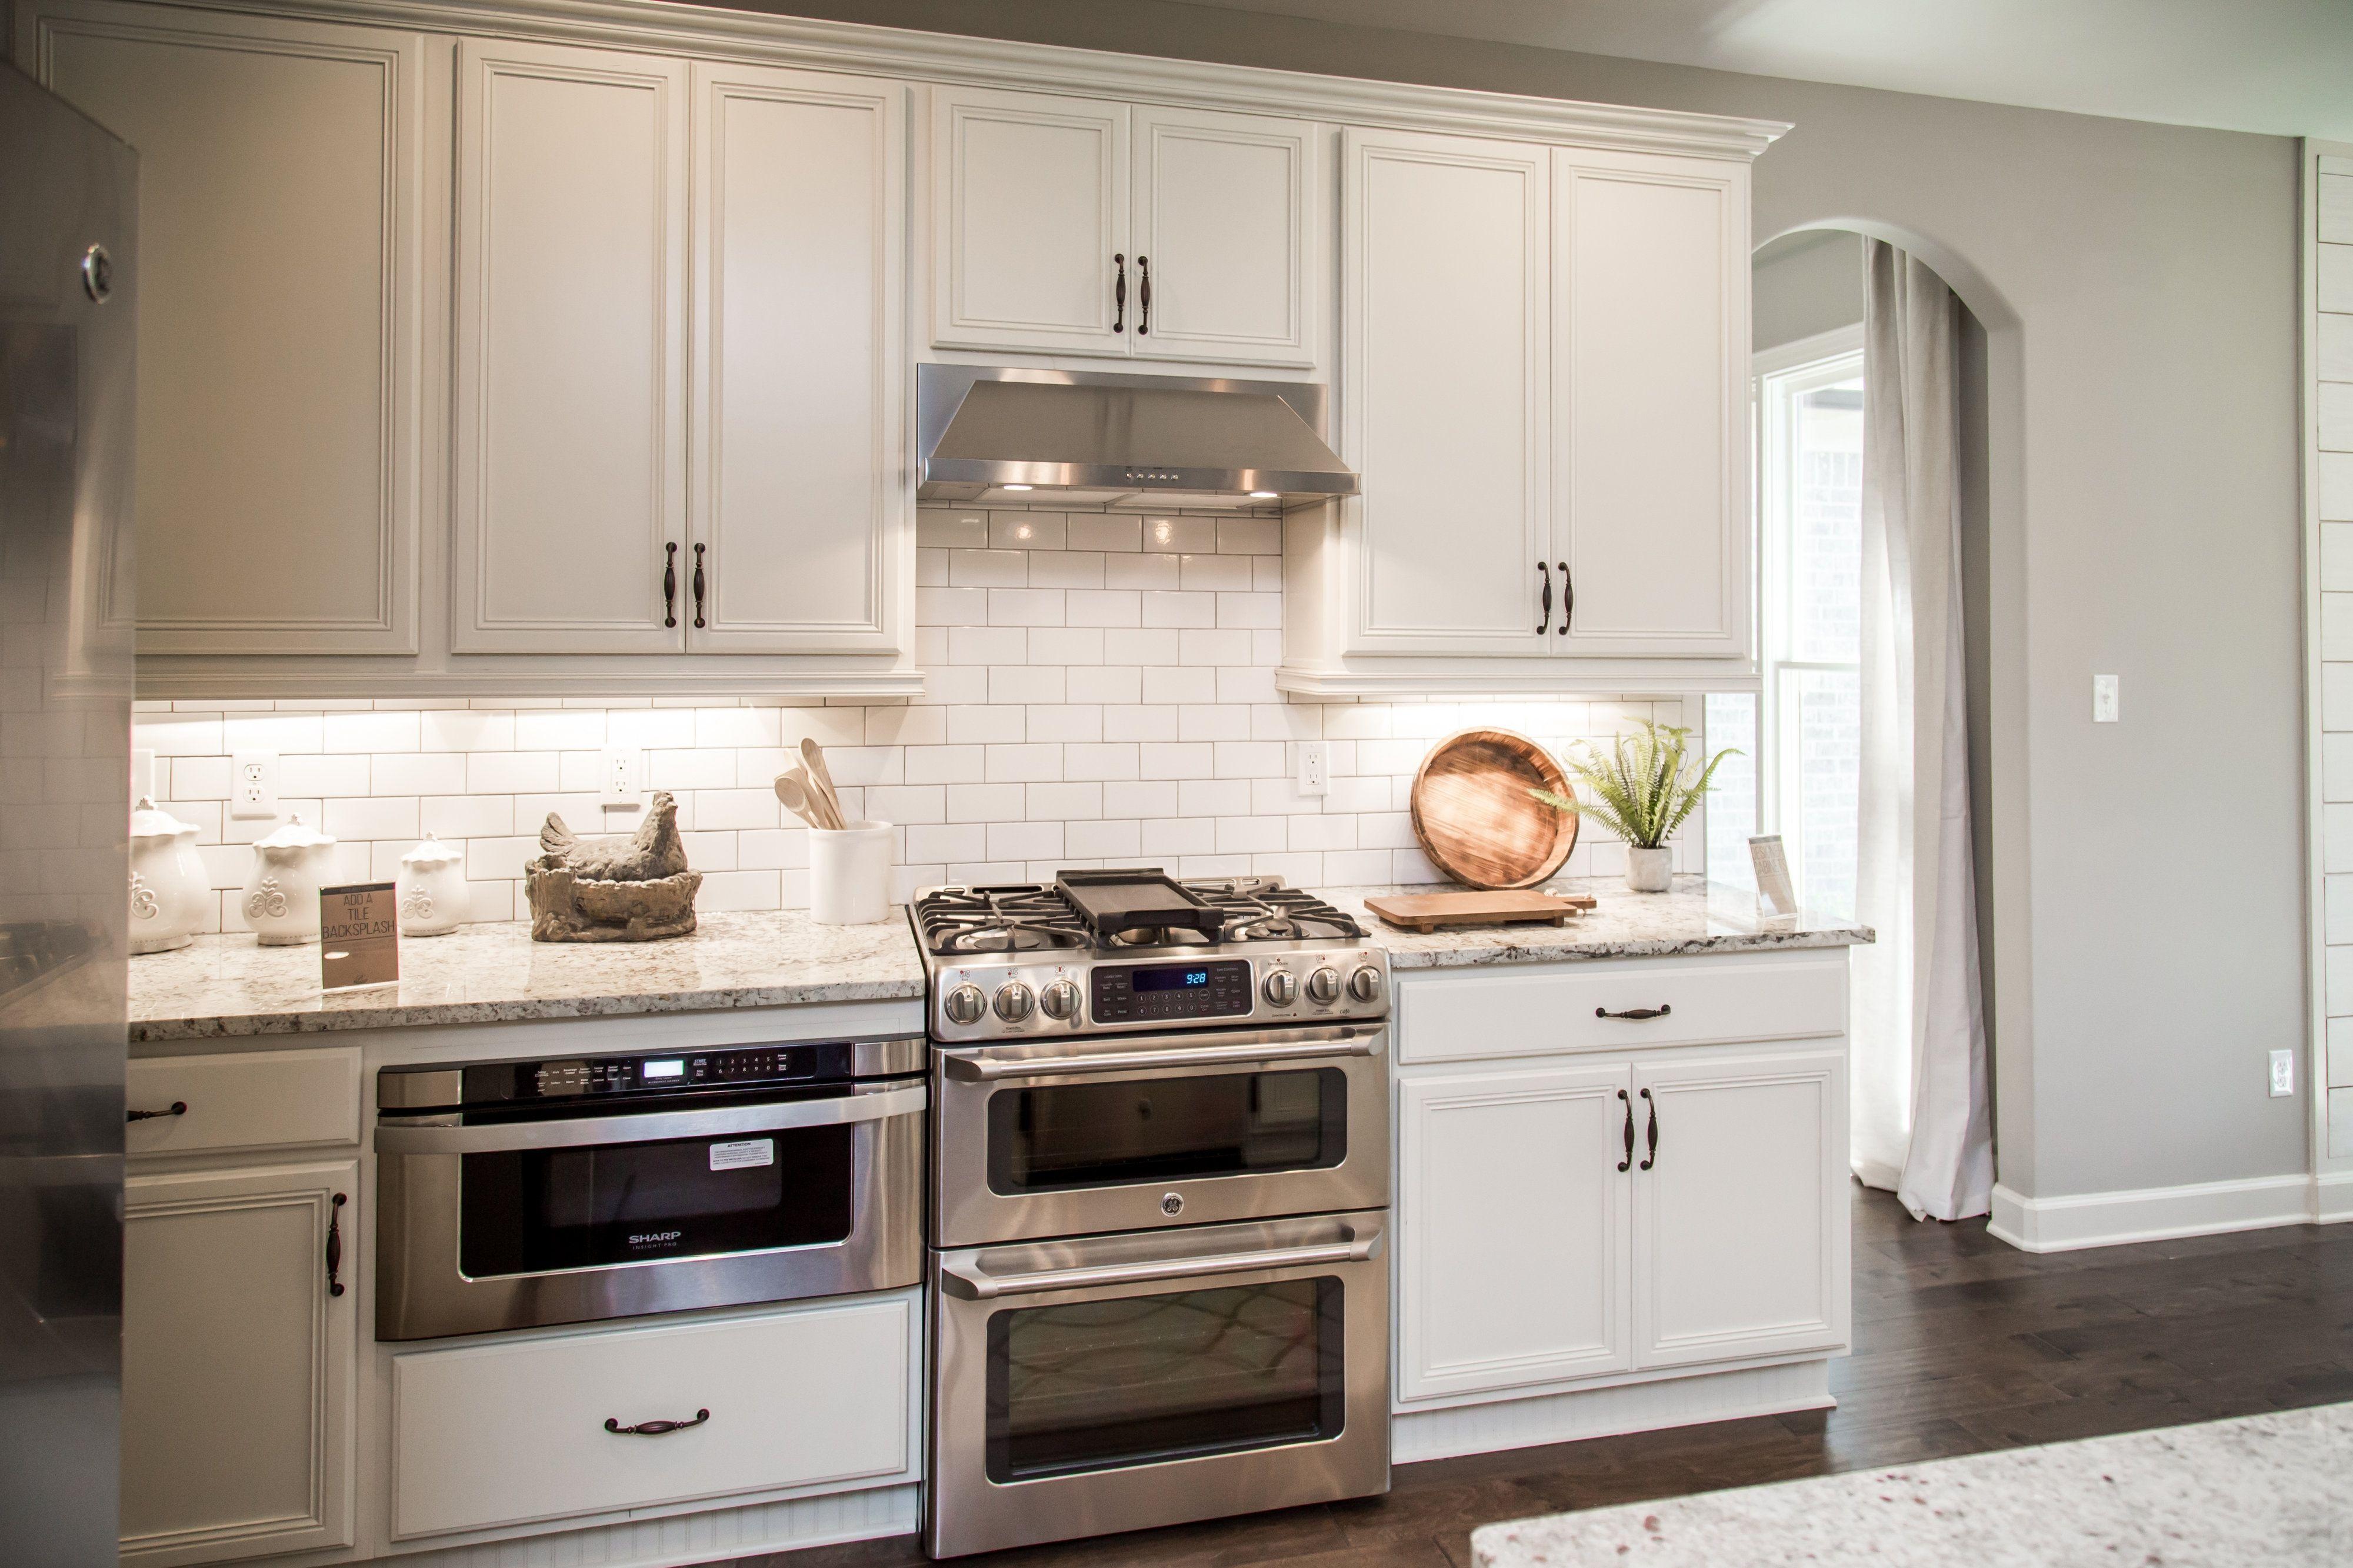 Photo Galleries Regency Homebuilders New Homes In Memphis Tn Buy Kitchen Cabinets Best Kitchen Cabinets Kitchen